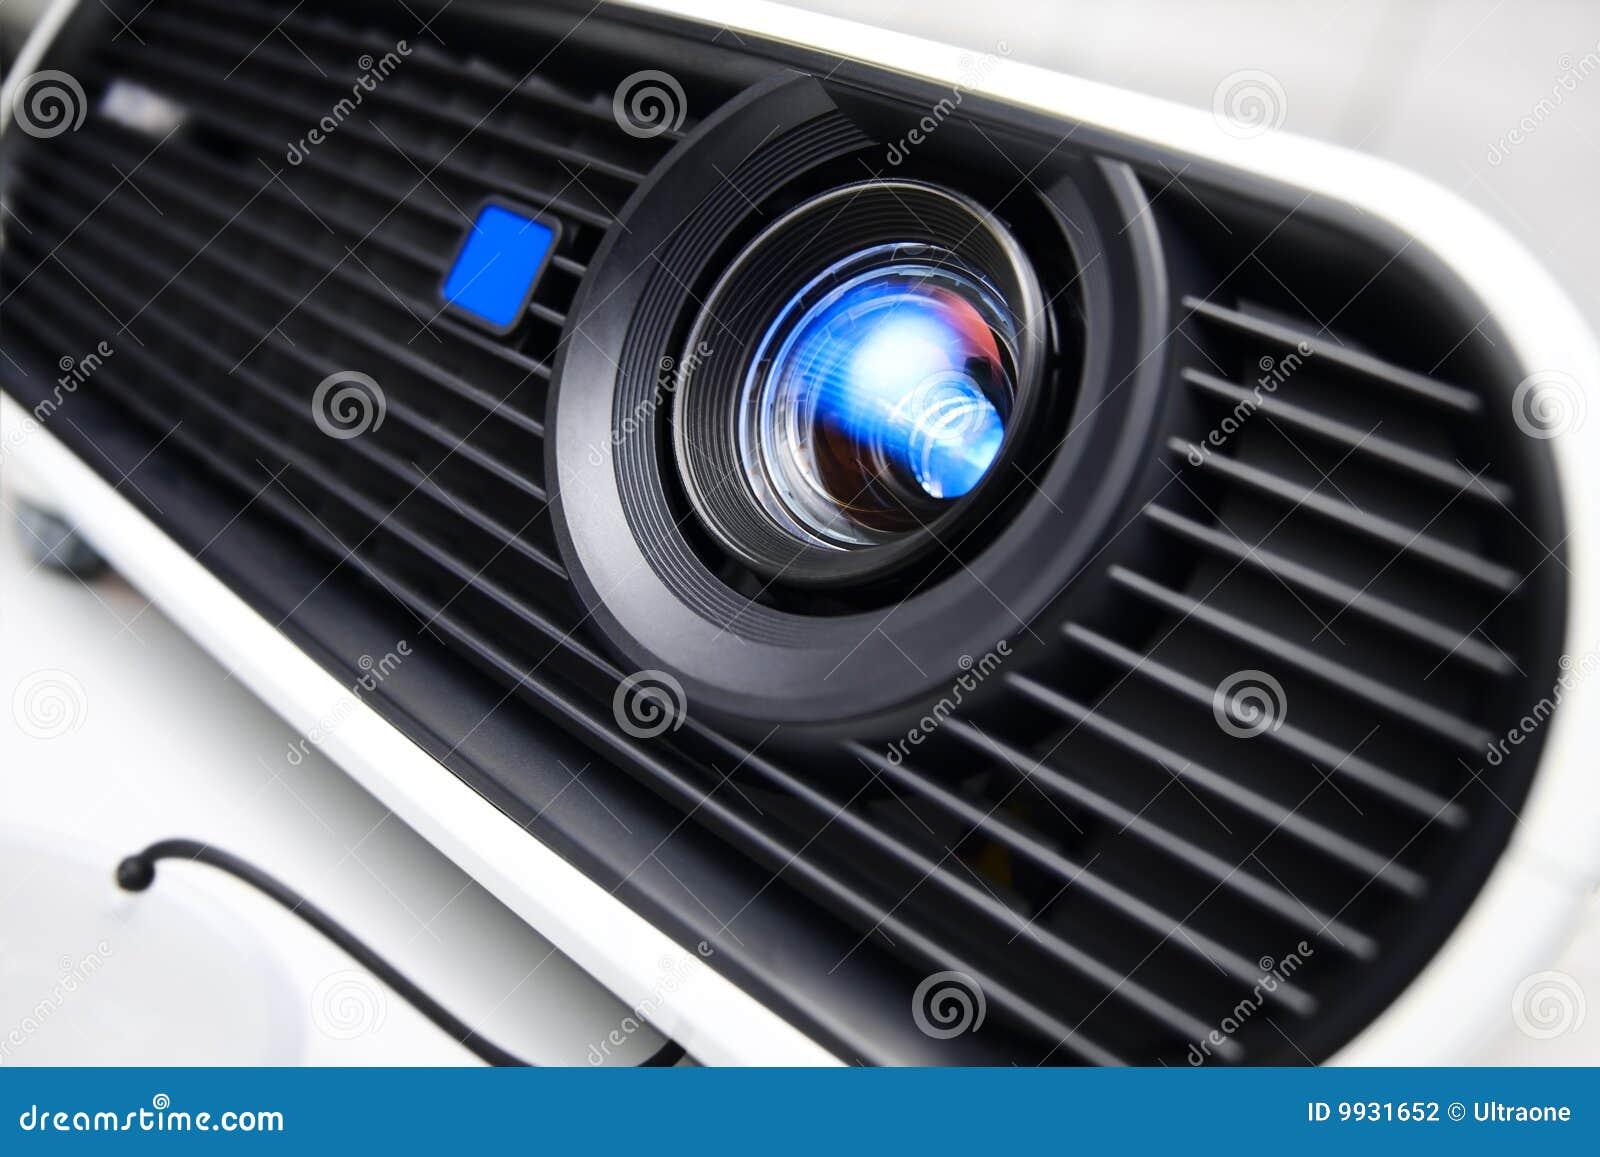 Multimedia projector closeup.